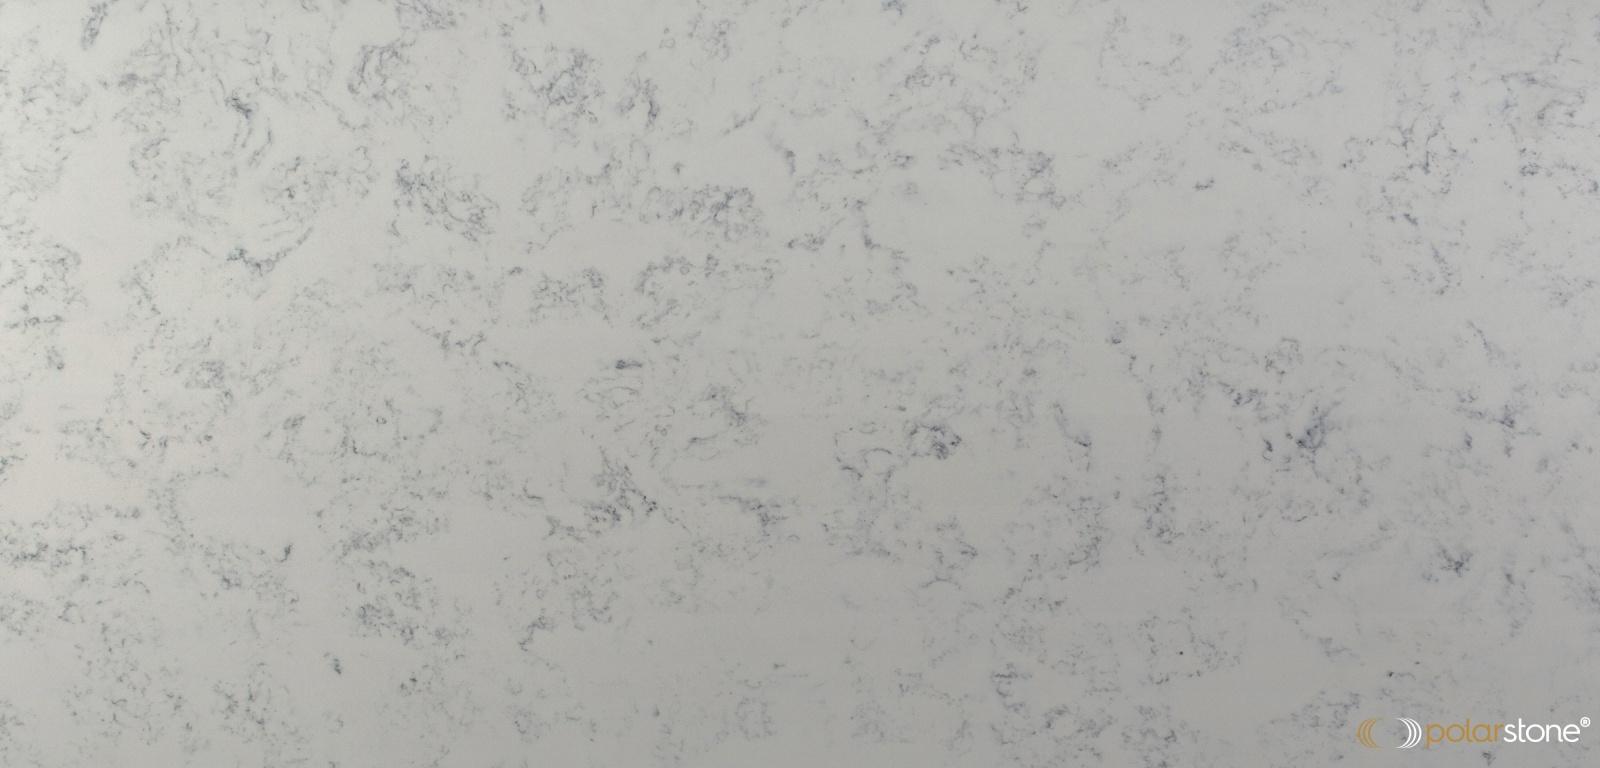 polarstone ibiza quartz countertops 7100 quartz polarstone near me. Black Bedroom Furniture Sets. Home Design Ideas